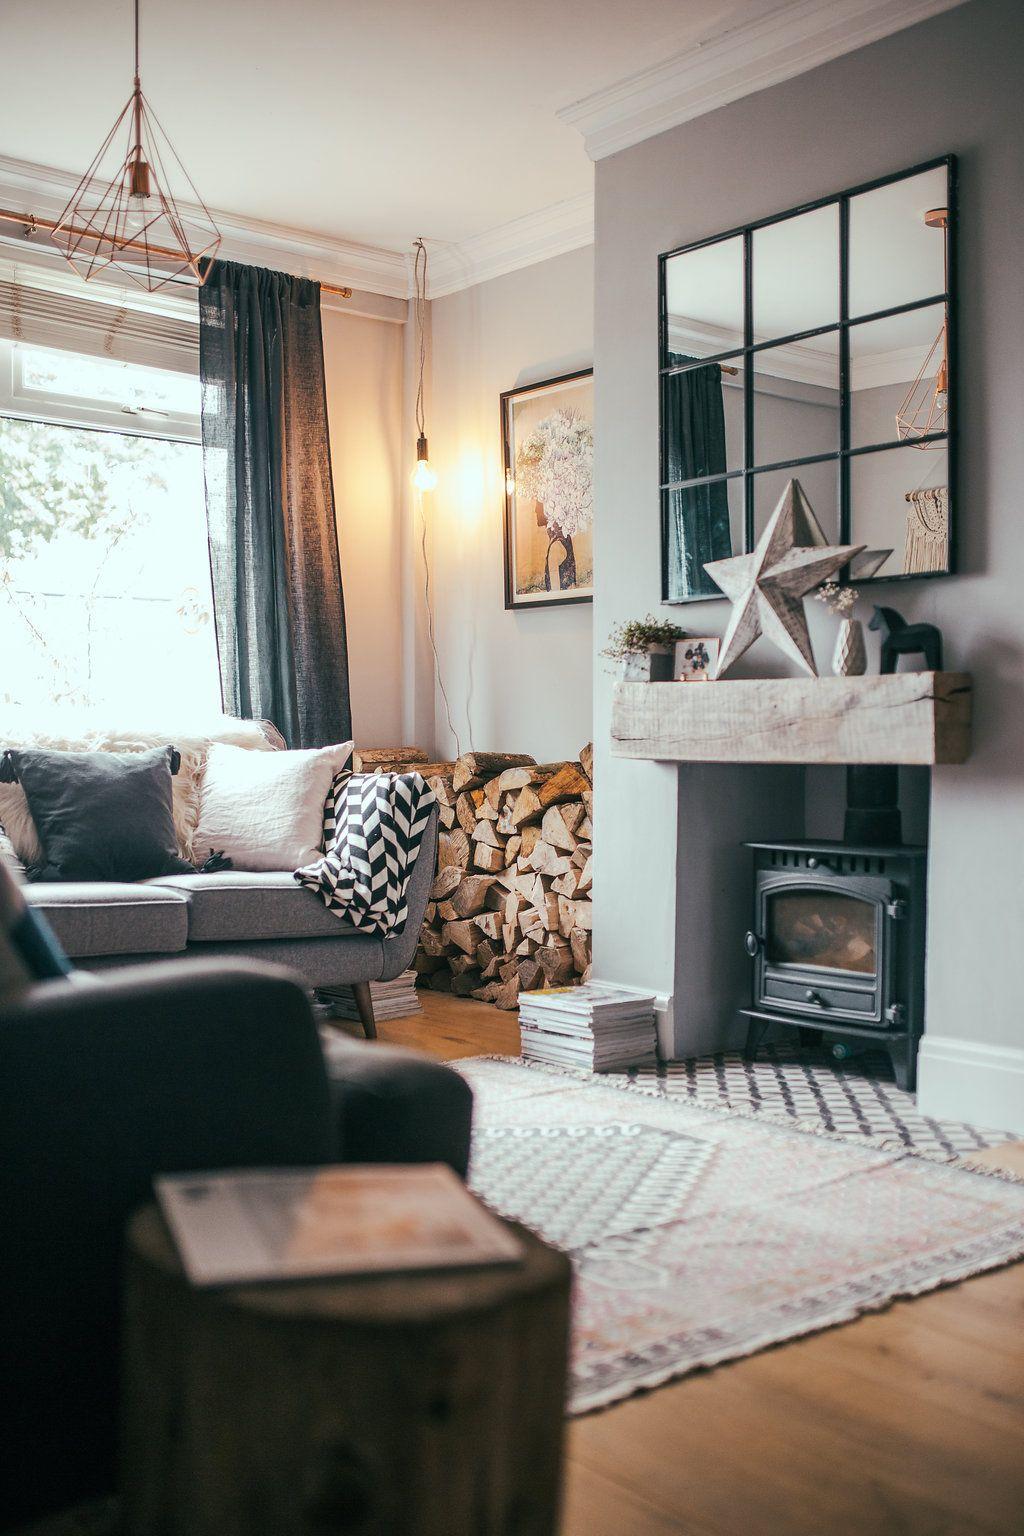 Decor Ideas For Living Rooms: Living Room Decor, Living Room